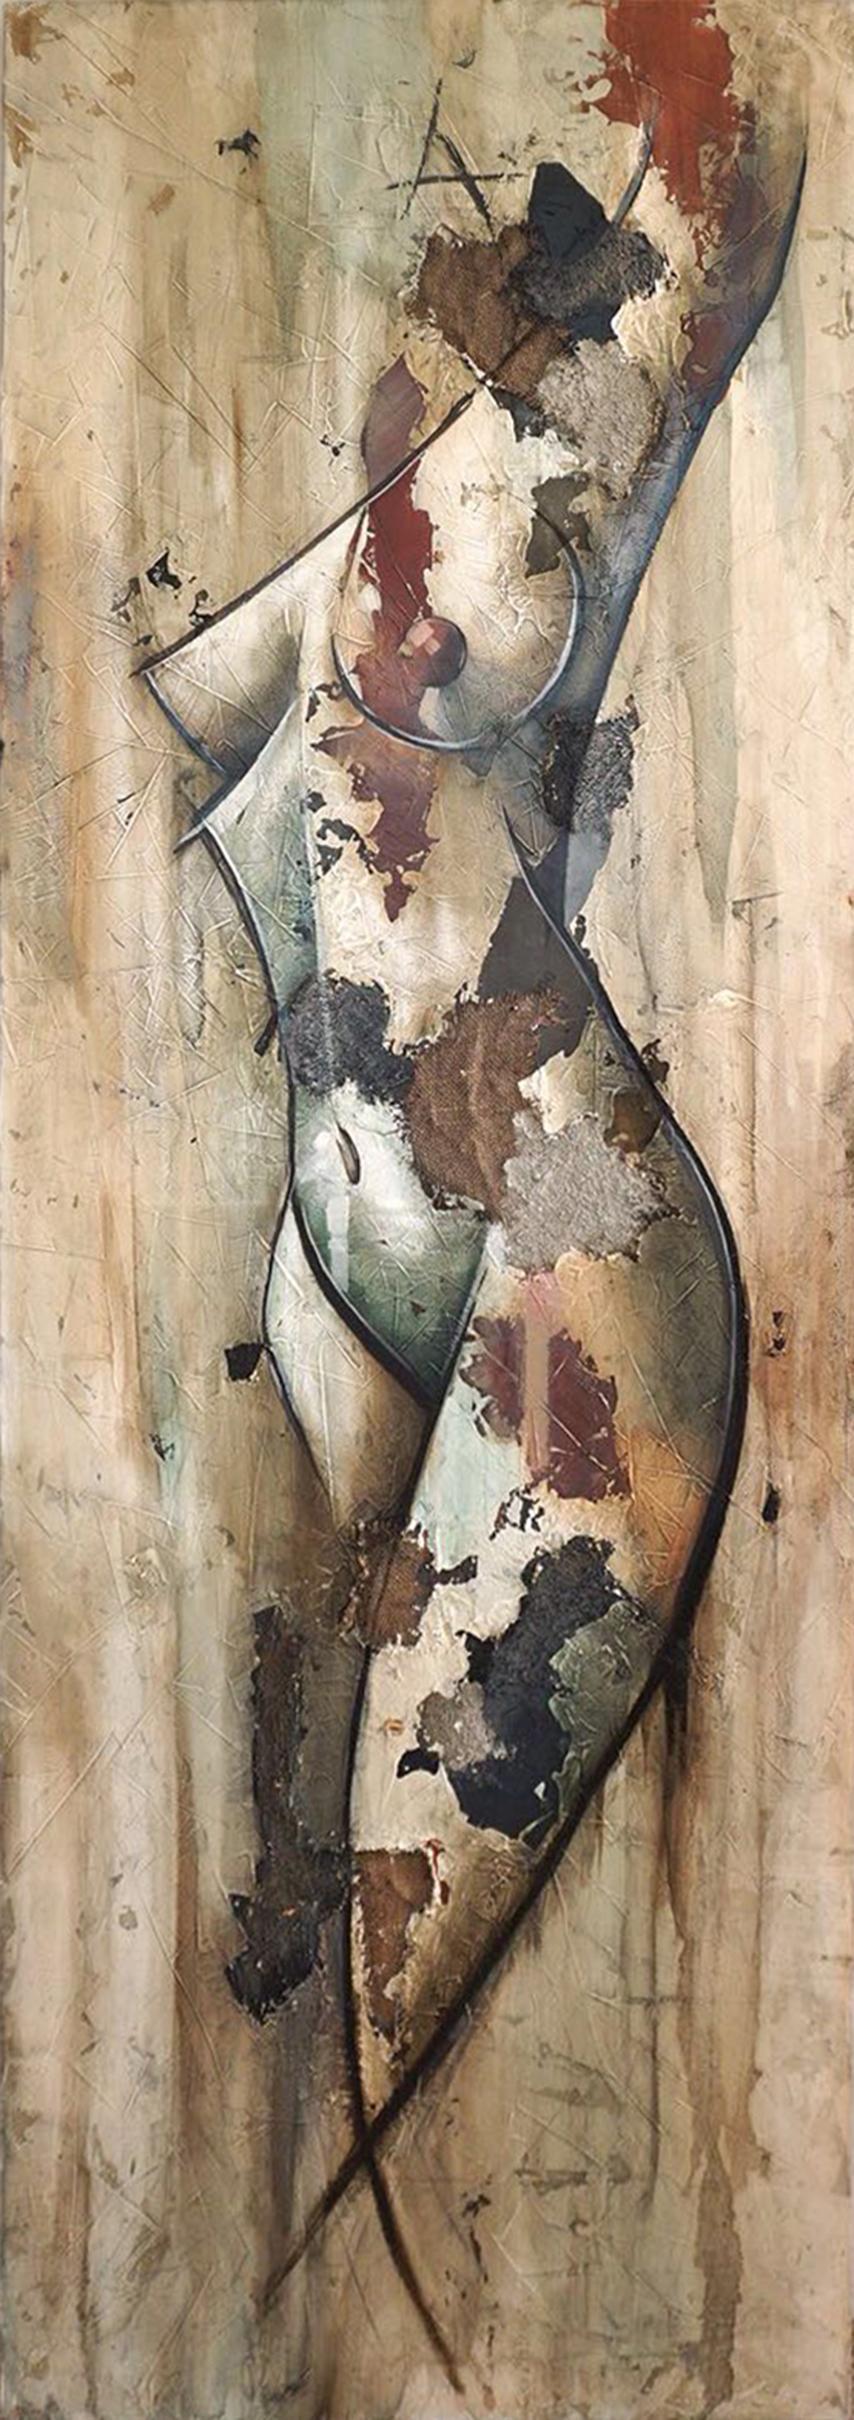 Silhoutte by Francisco Jimenez - Mid-Century Modern Nude Figurative Painting